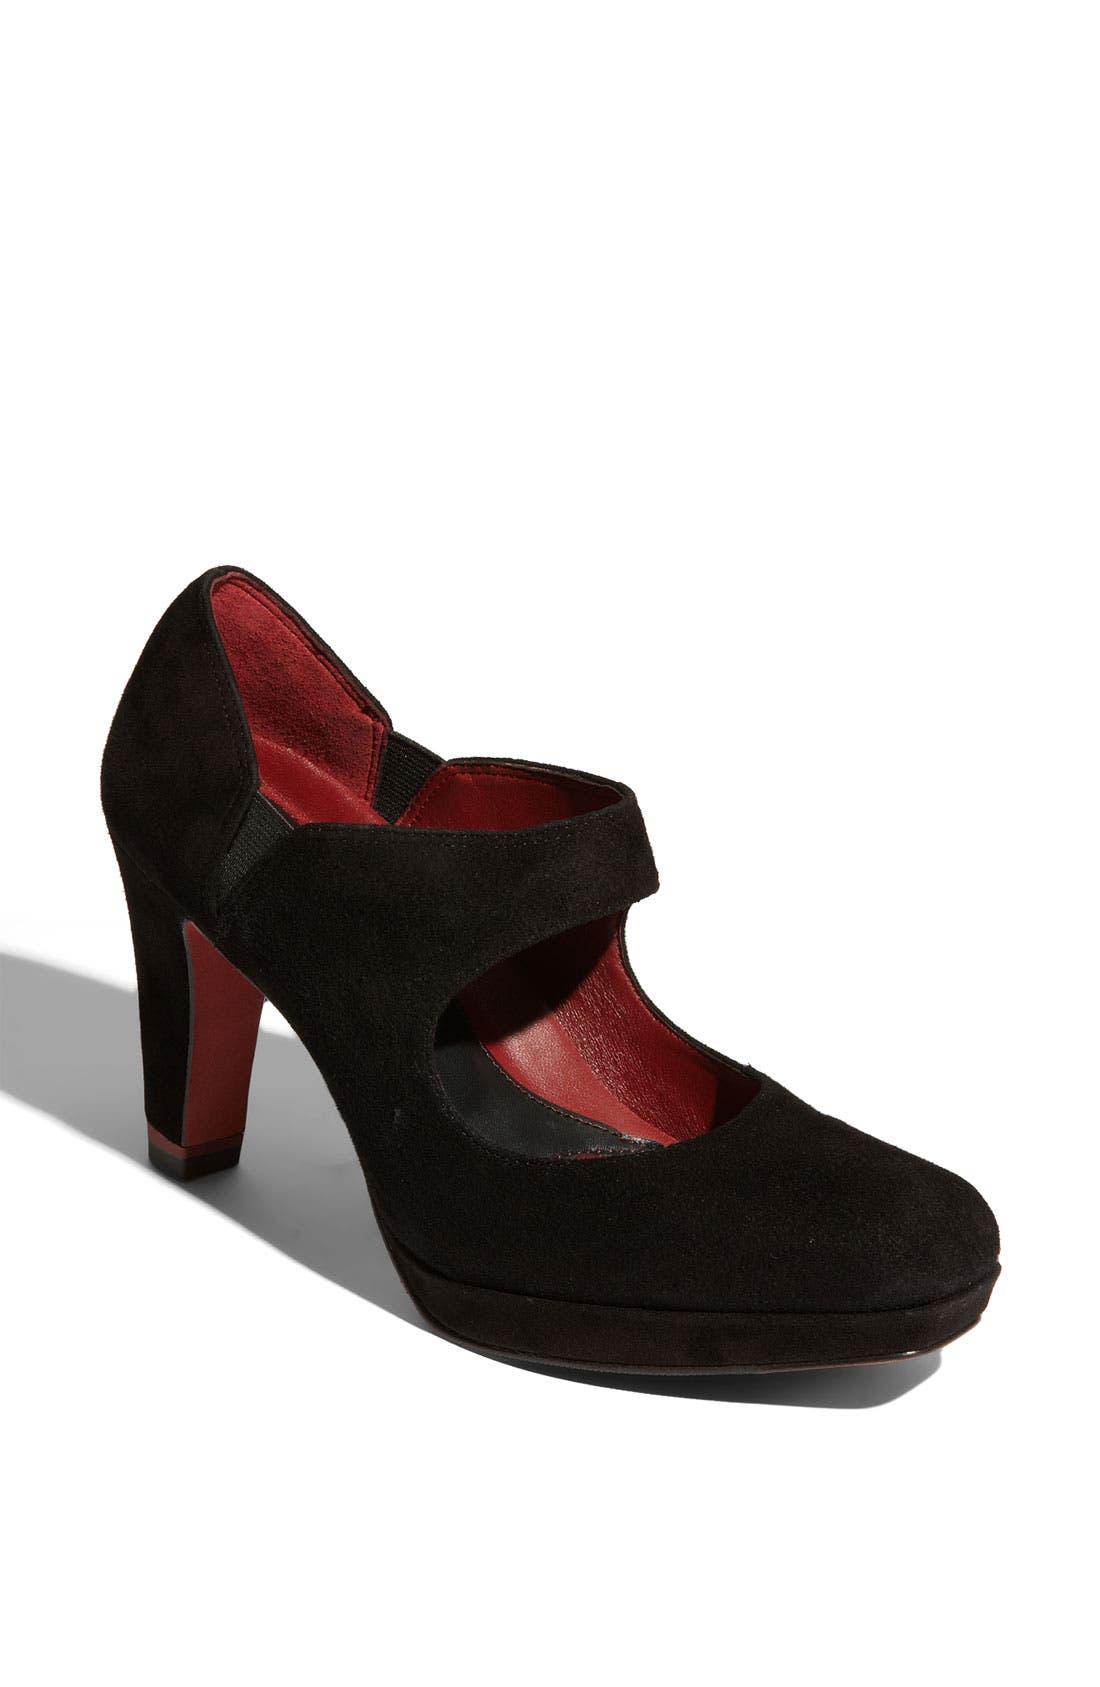 Main Image - Oh! Shoes 'Tori' Mary Jane Pump